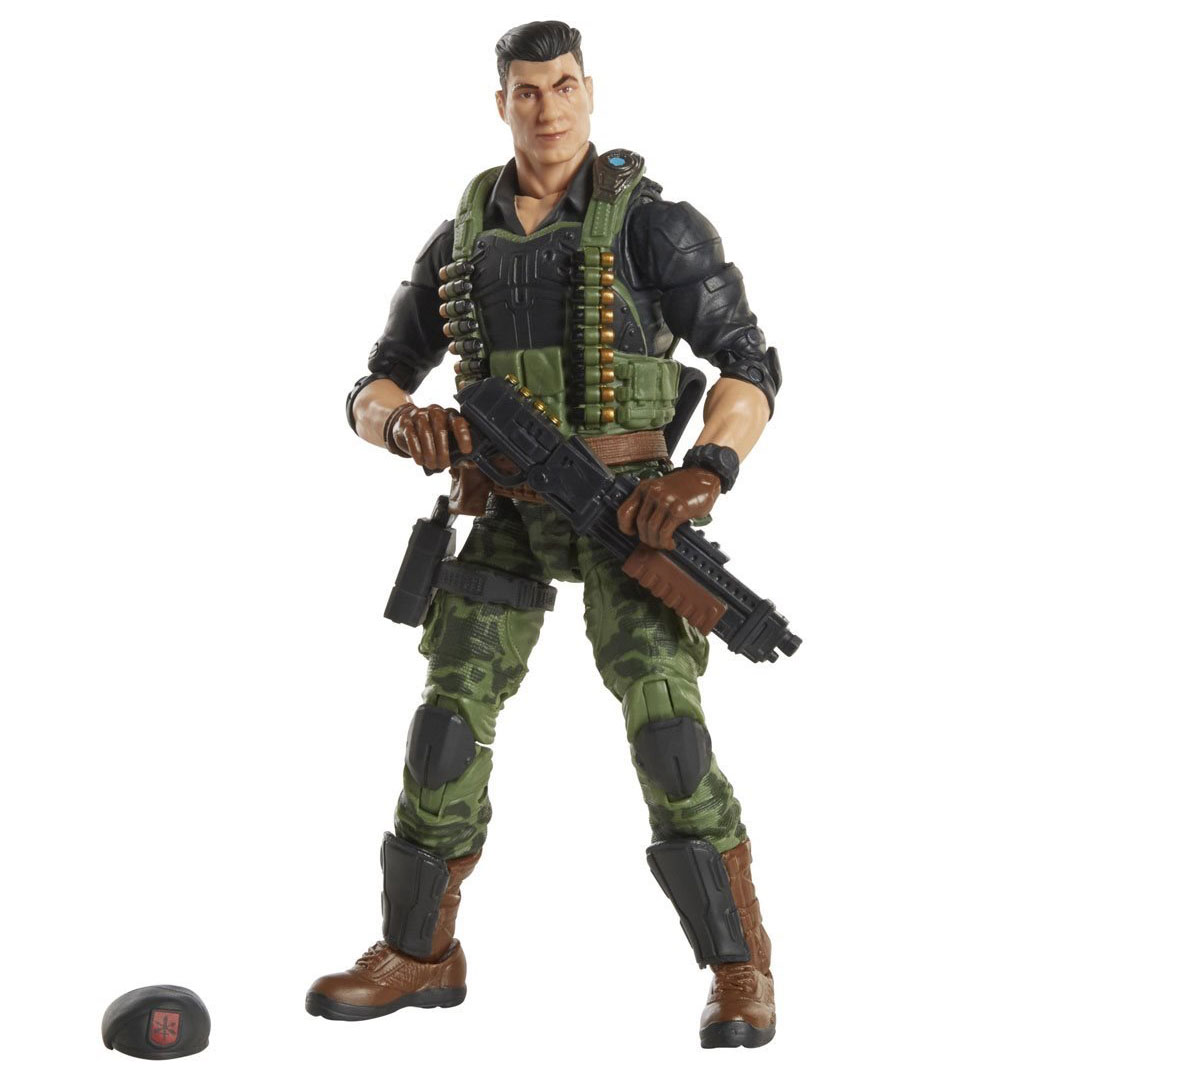 gi-joe-classified-series-flint-action-figure-4